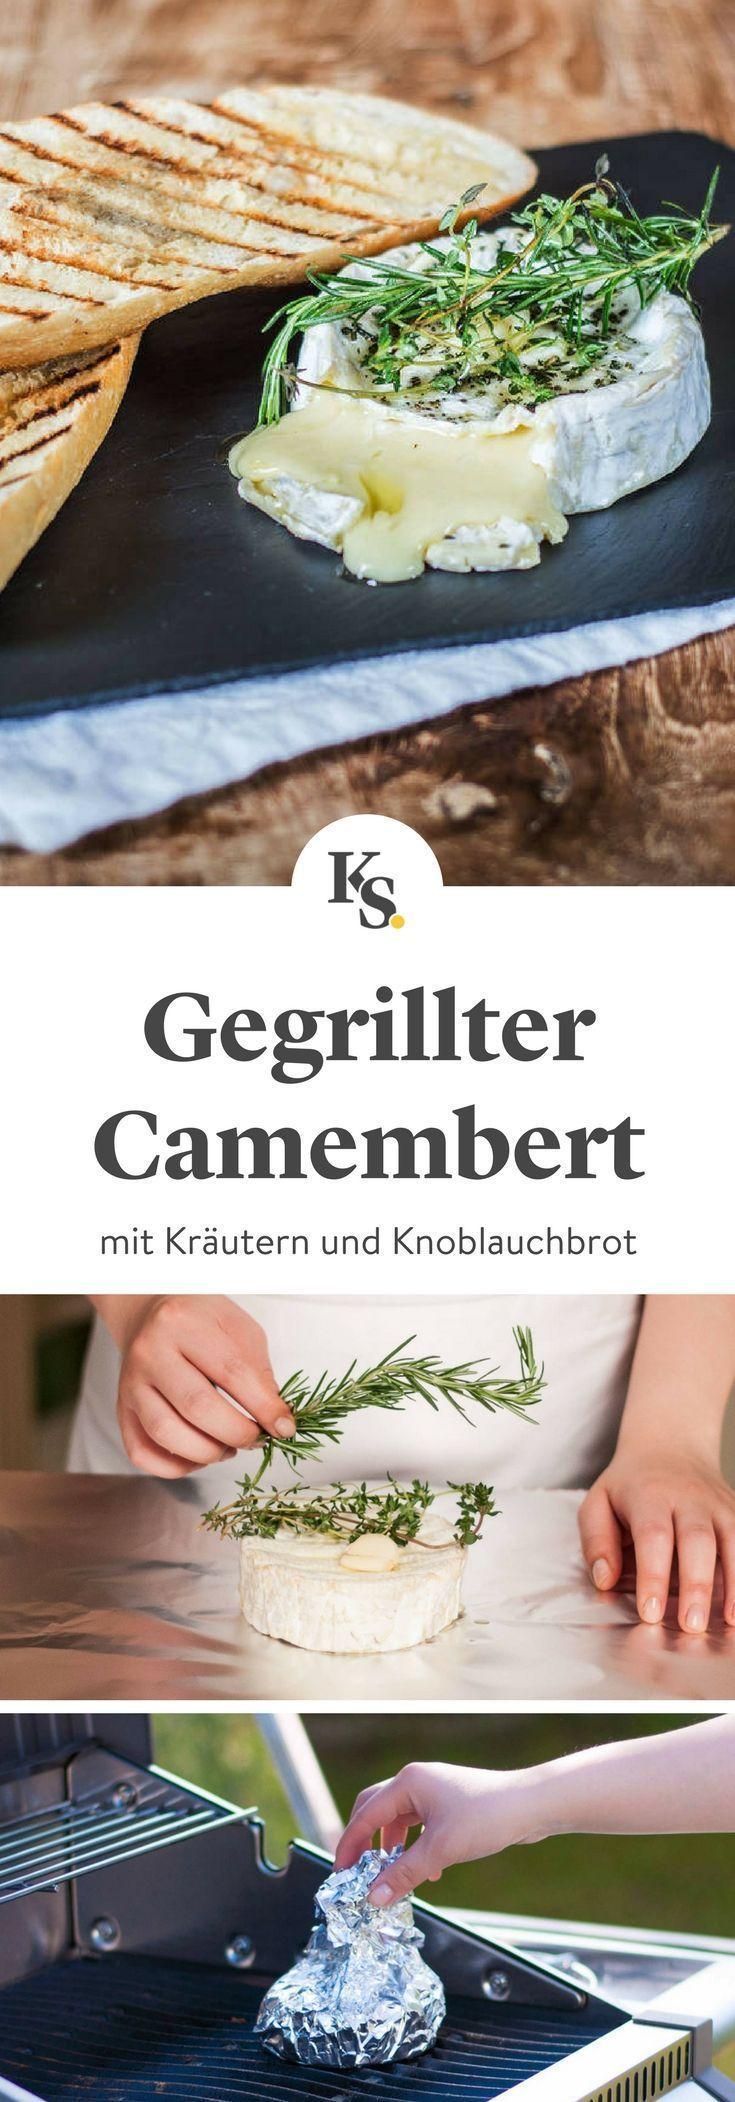 Grilled camembert with garlic bread Recipe | Kitchen stories,  #bread #camembert #garlic #Grilled #Kitchen #Recipe #stories #vegetariancampingfood